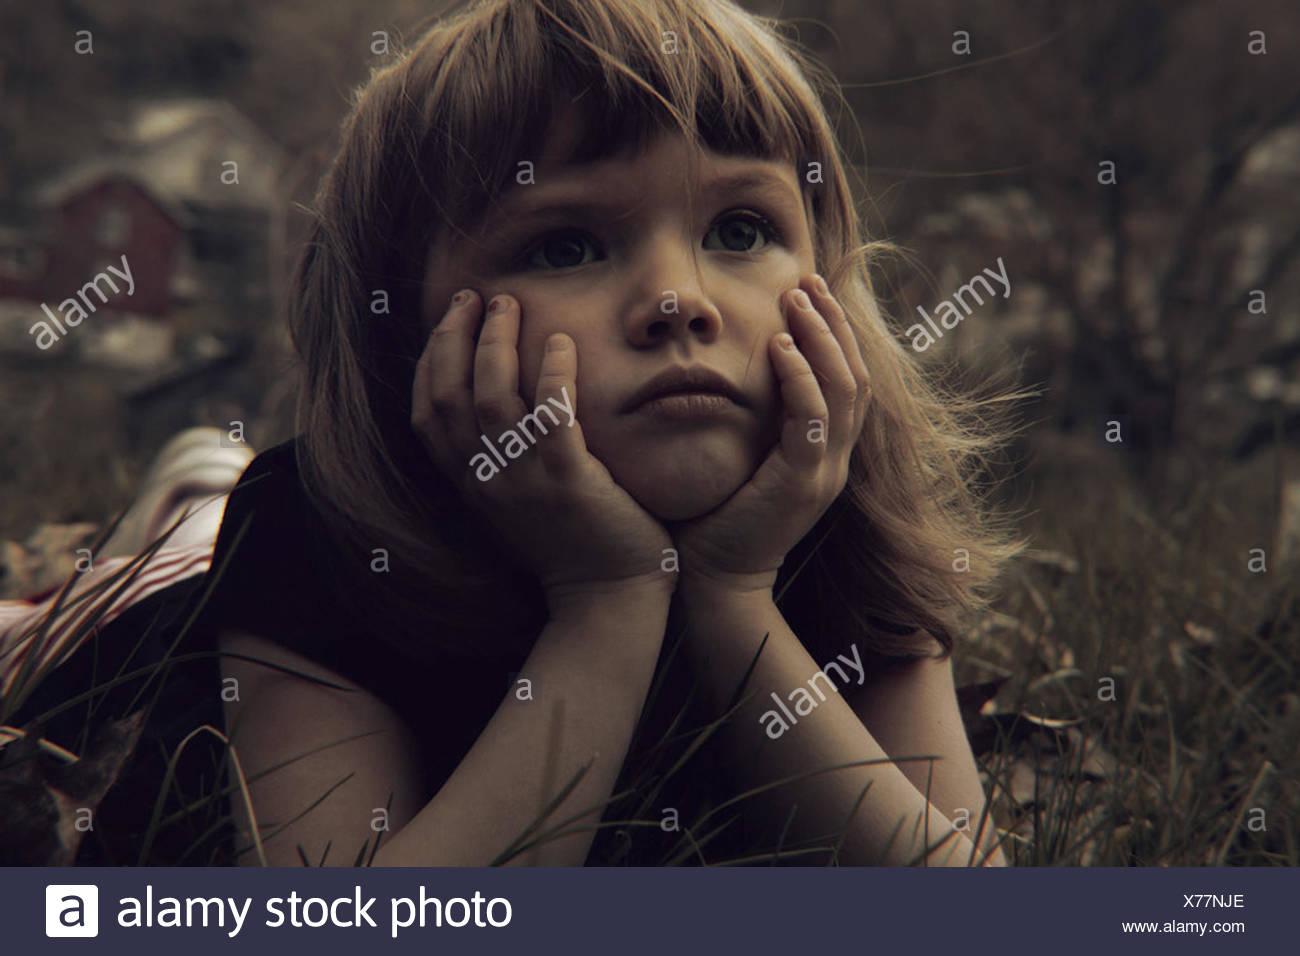 Girl lying in meadow - Stock Image